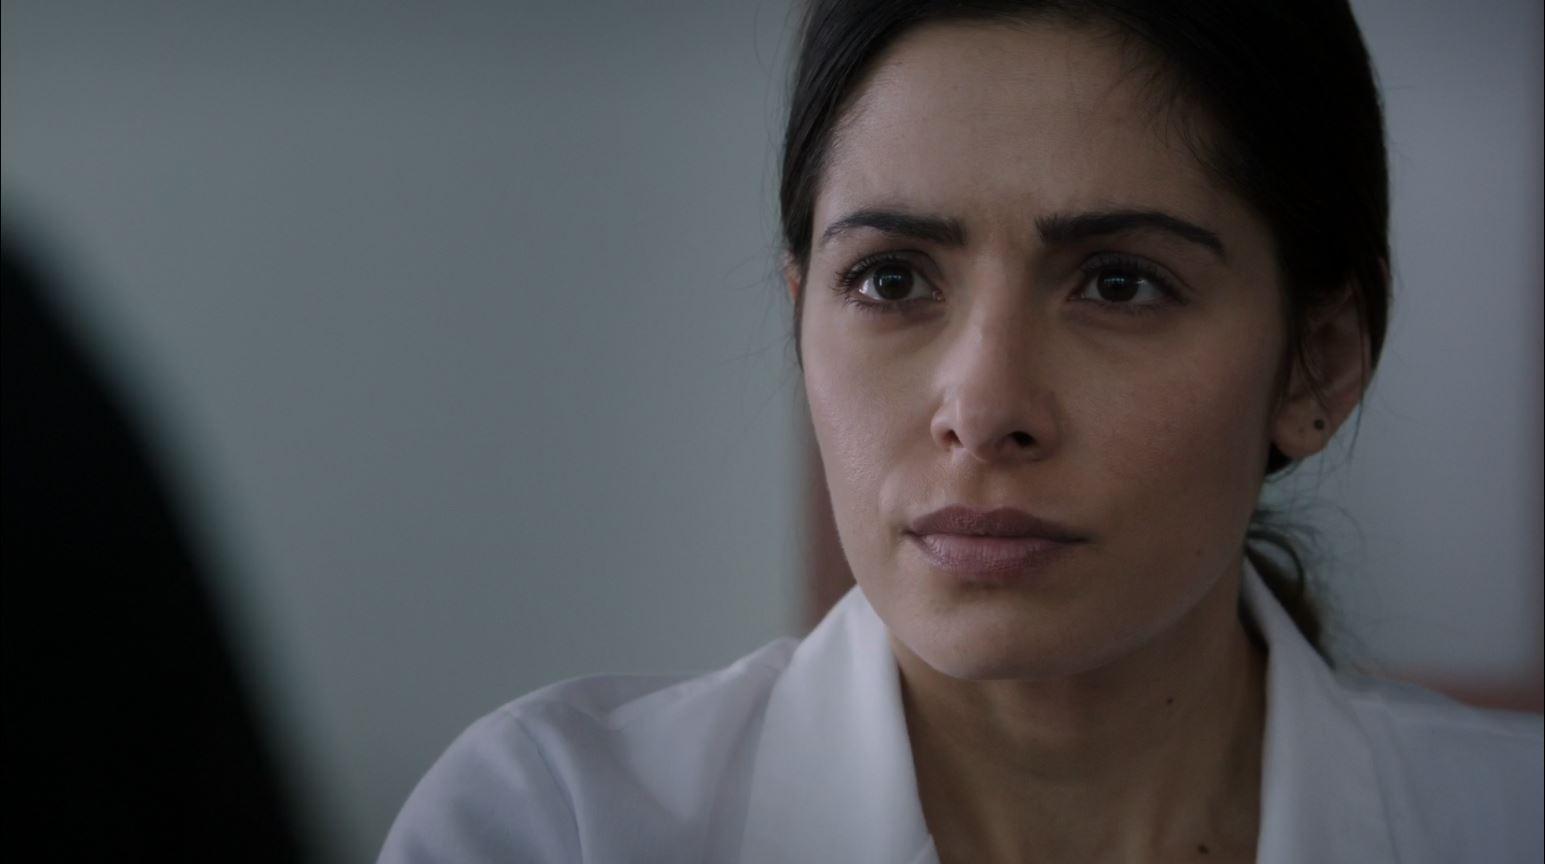 Person of Interest - Lethe - Sarah Shahi as Samantha Shaw